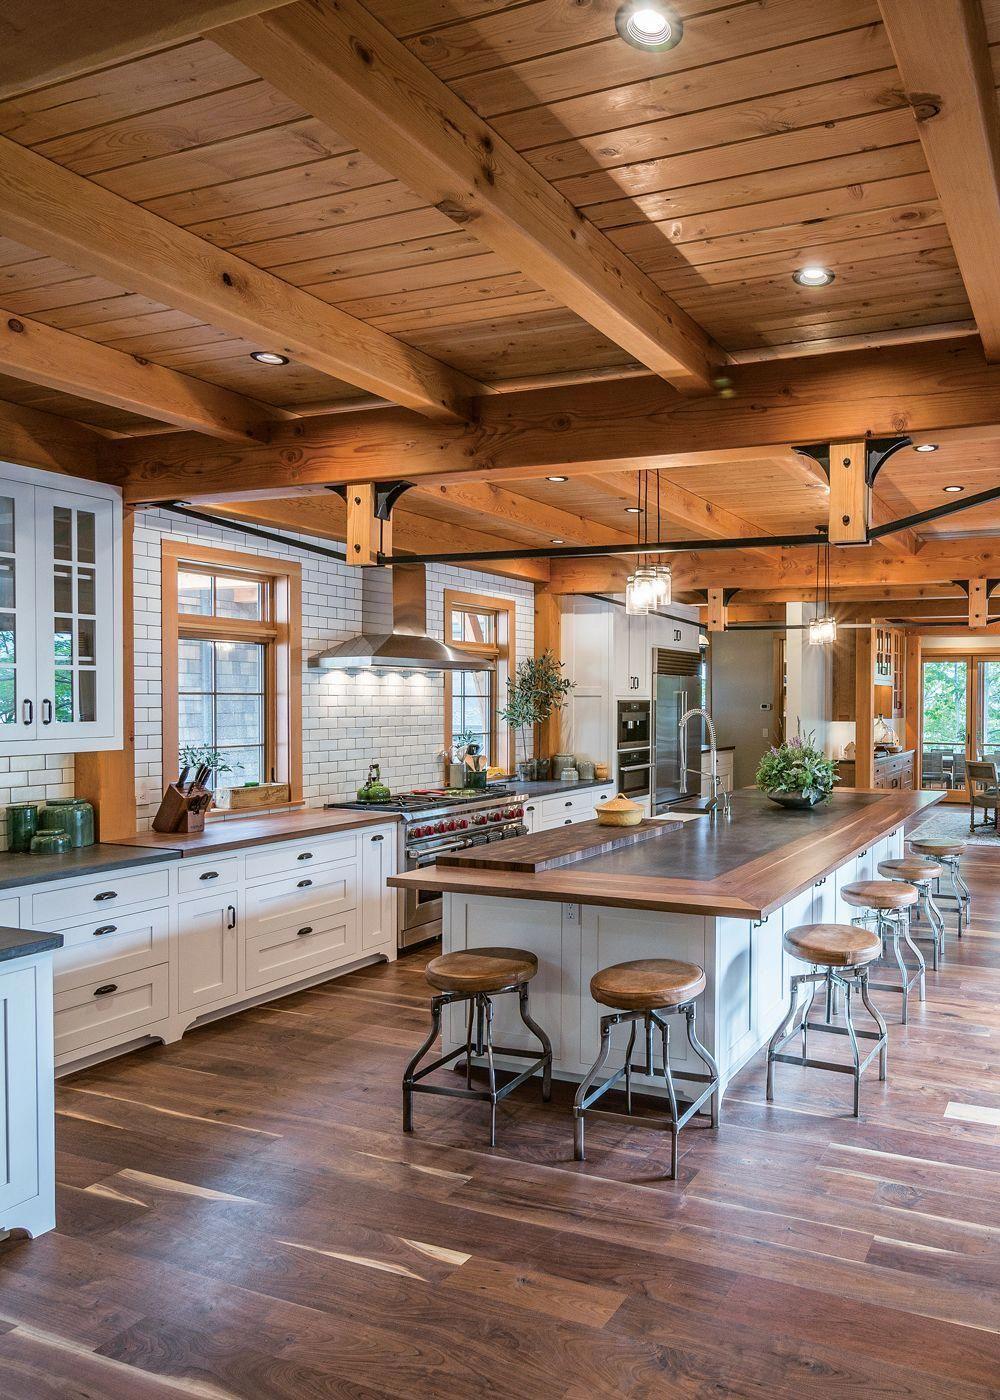 25 Stress-Free Rustic Kitchen Ideas (All Are Marvellous!) - Ef397F1B42Cc176F613A0654Bba0Ca7A